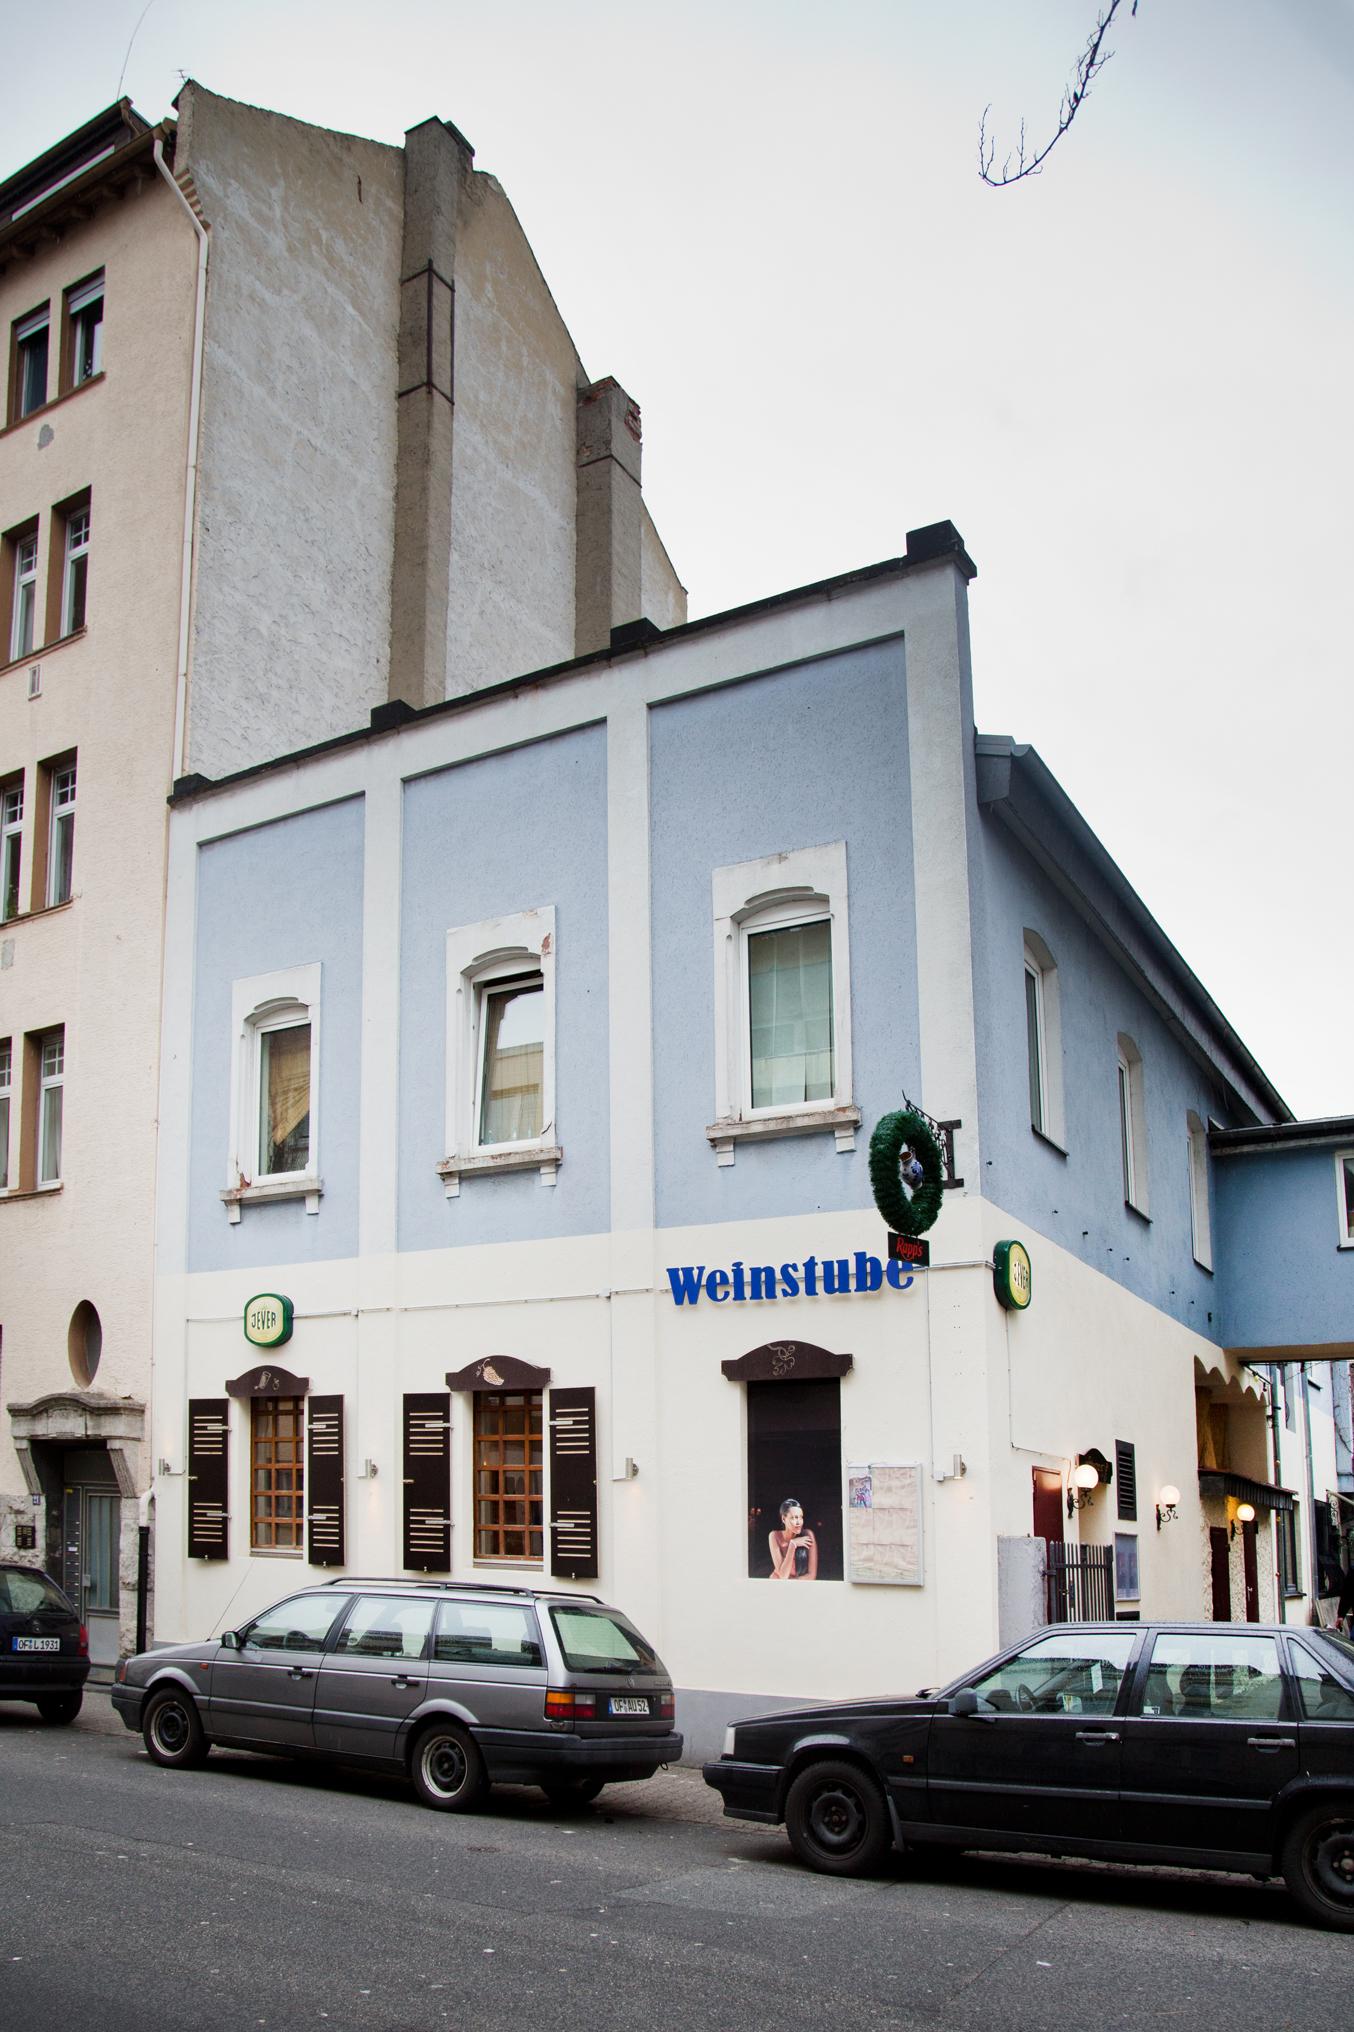 LG_Weinstube_DL_01.jpg